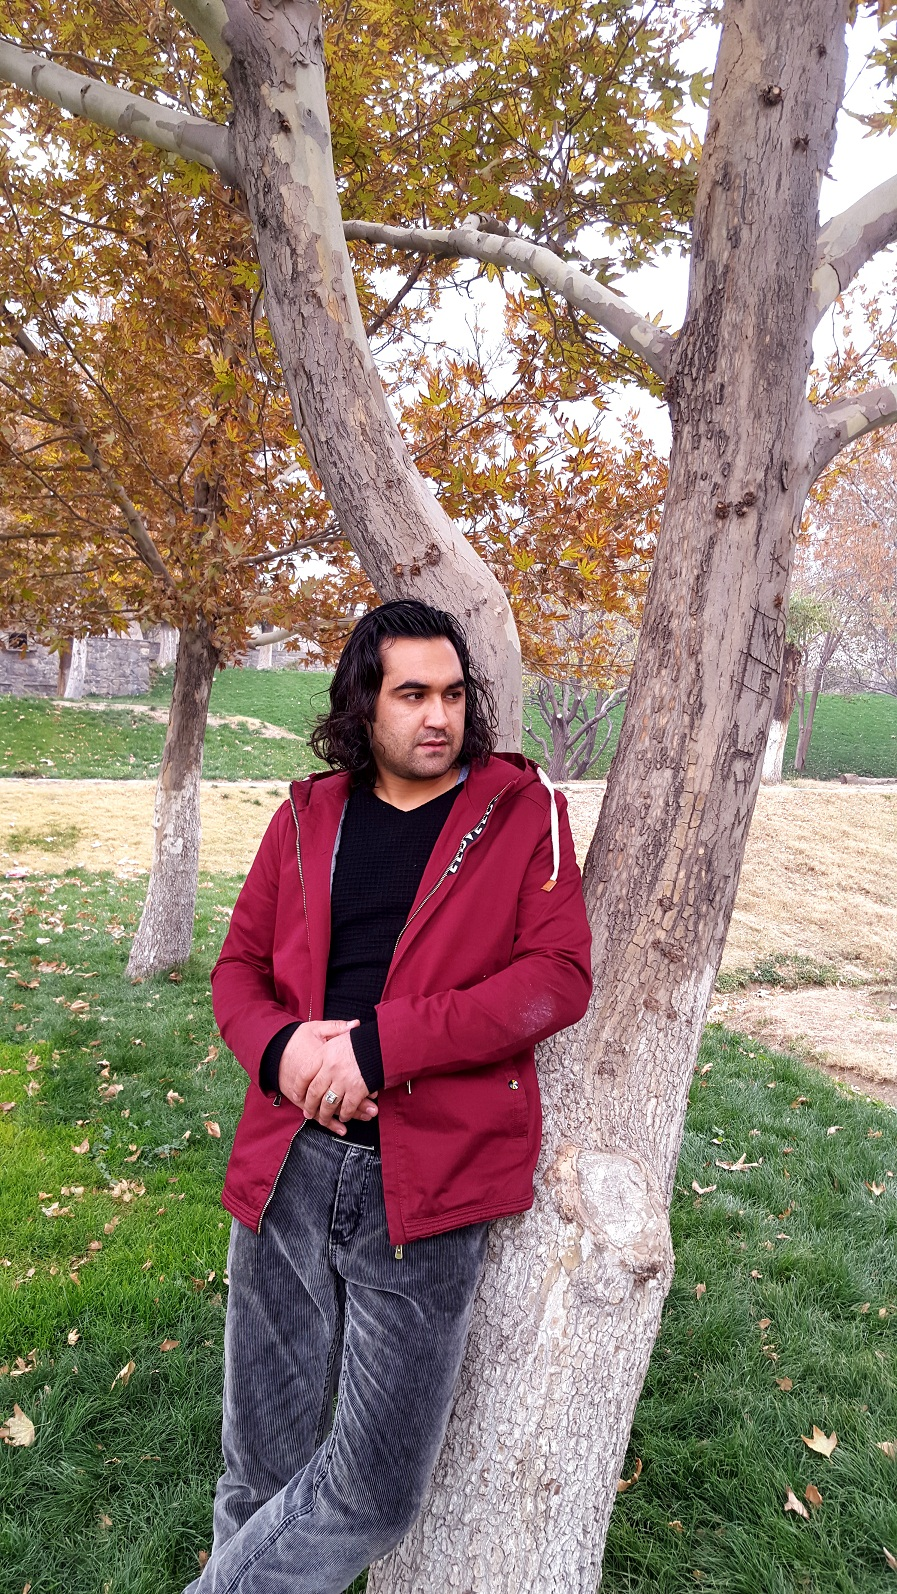 New images by Ahmad Mahmood Imperator تصاویر جدید احمد محمود امپراطور برگ ریزان 1396 هجری خورشیدی کابل افغانستان